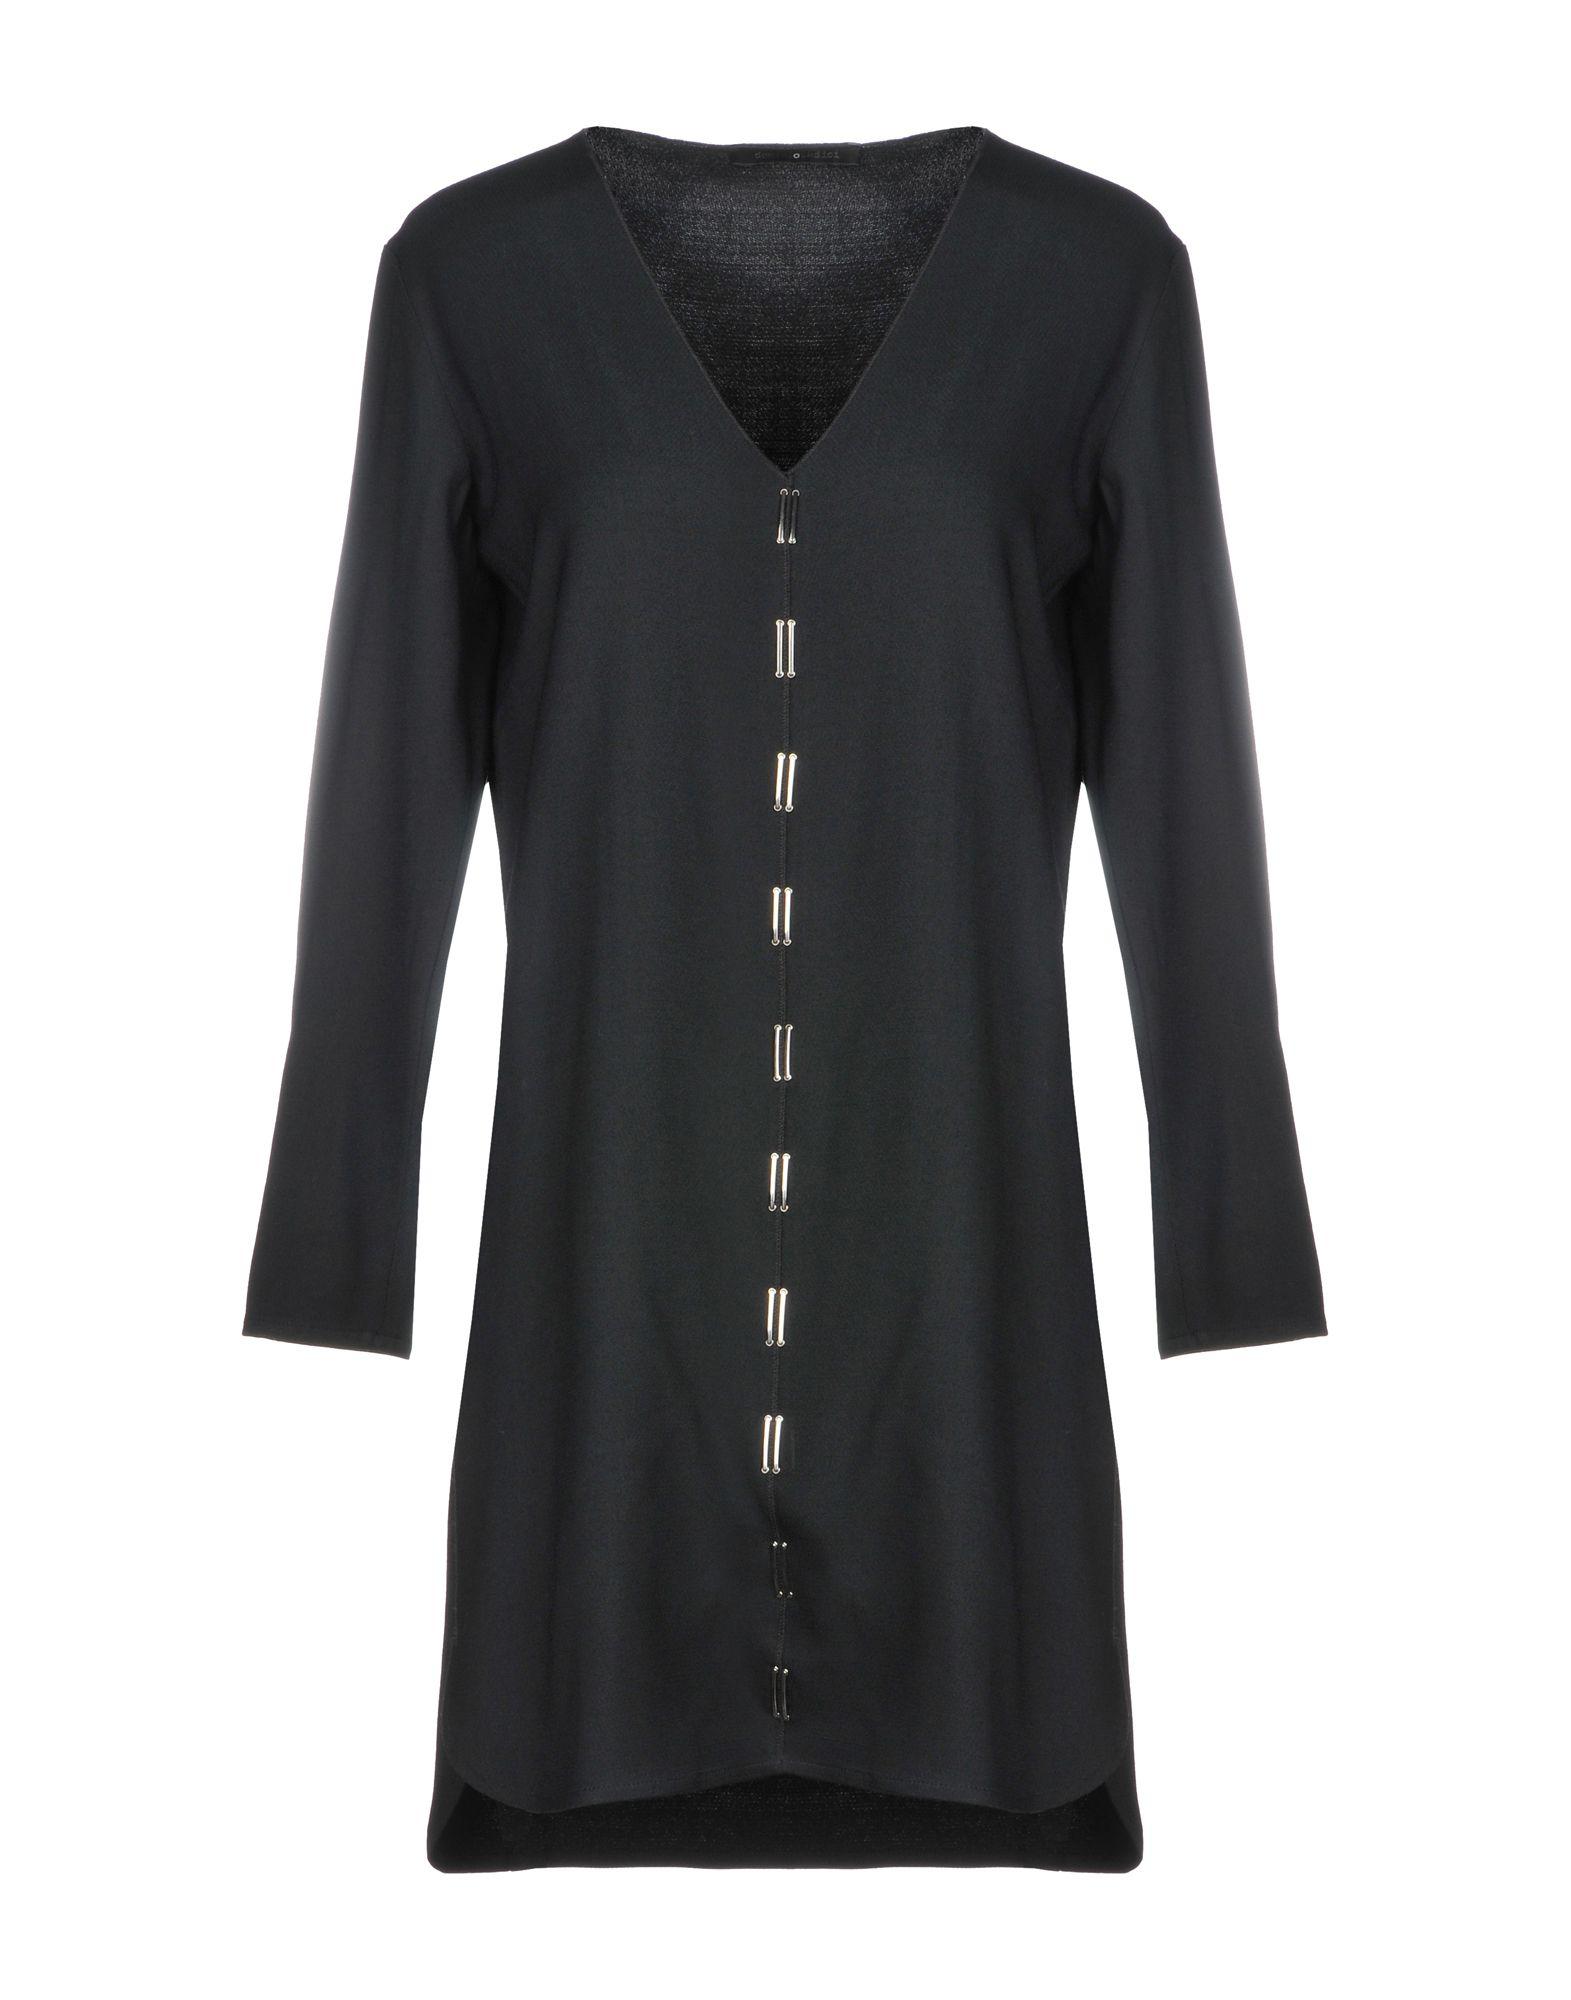 DOMINIOUNDICI | DOMINIOUNDICI Short dresses | Goxip